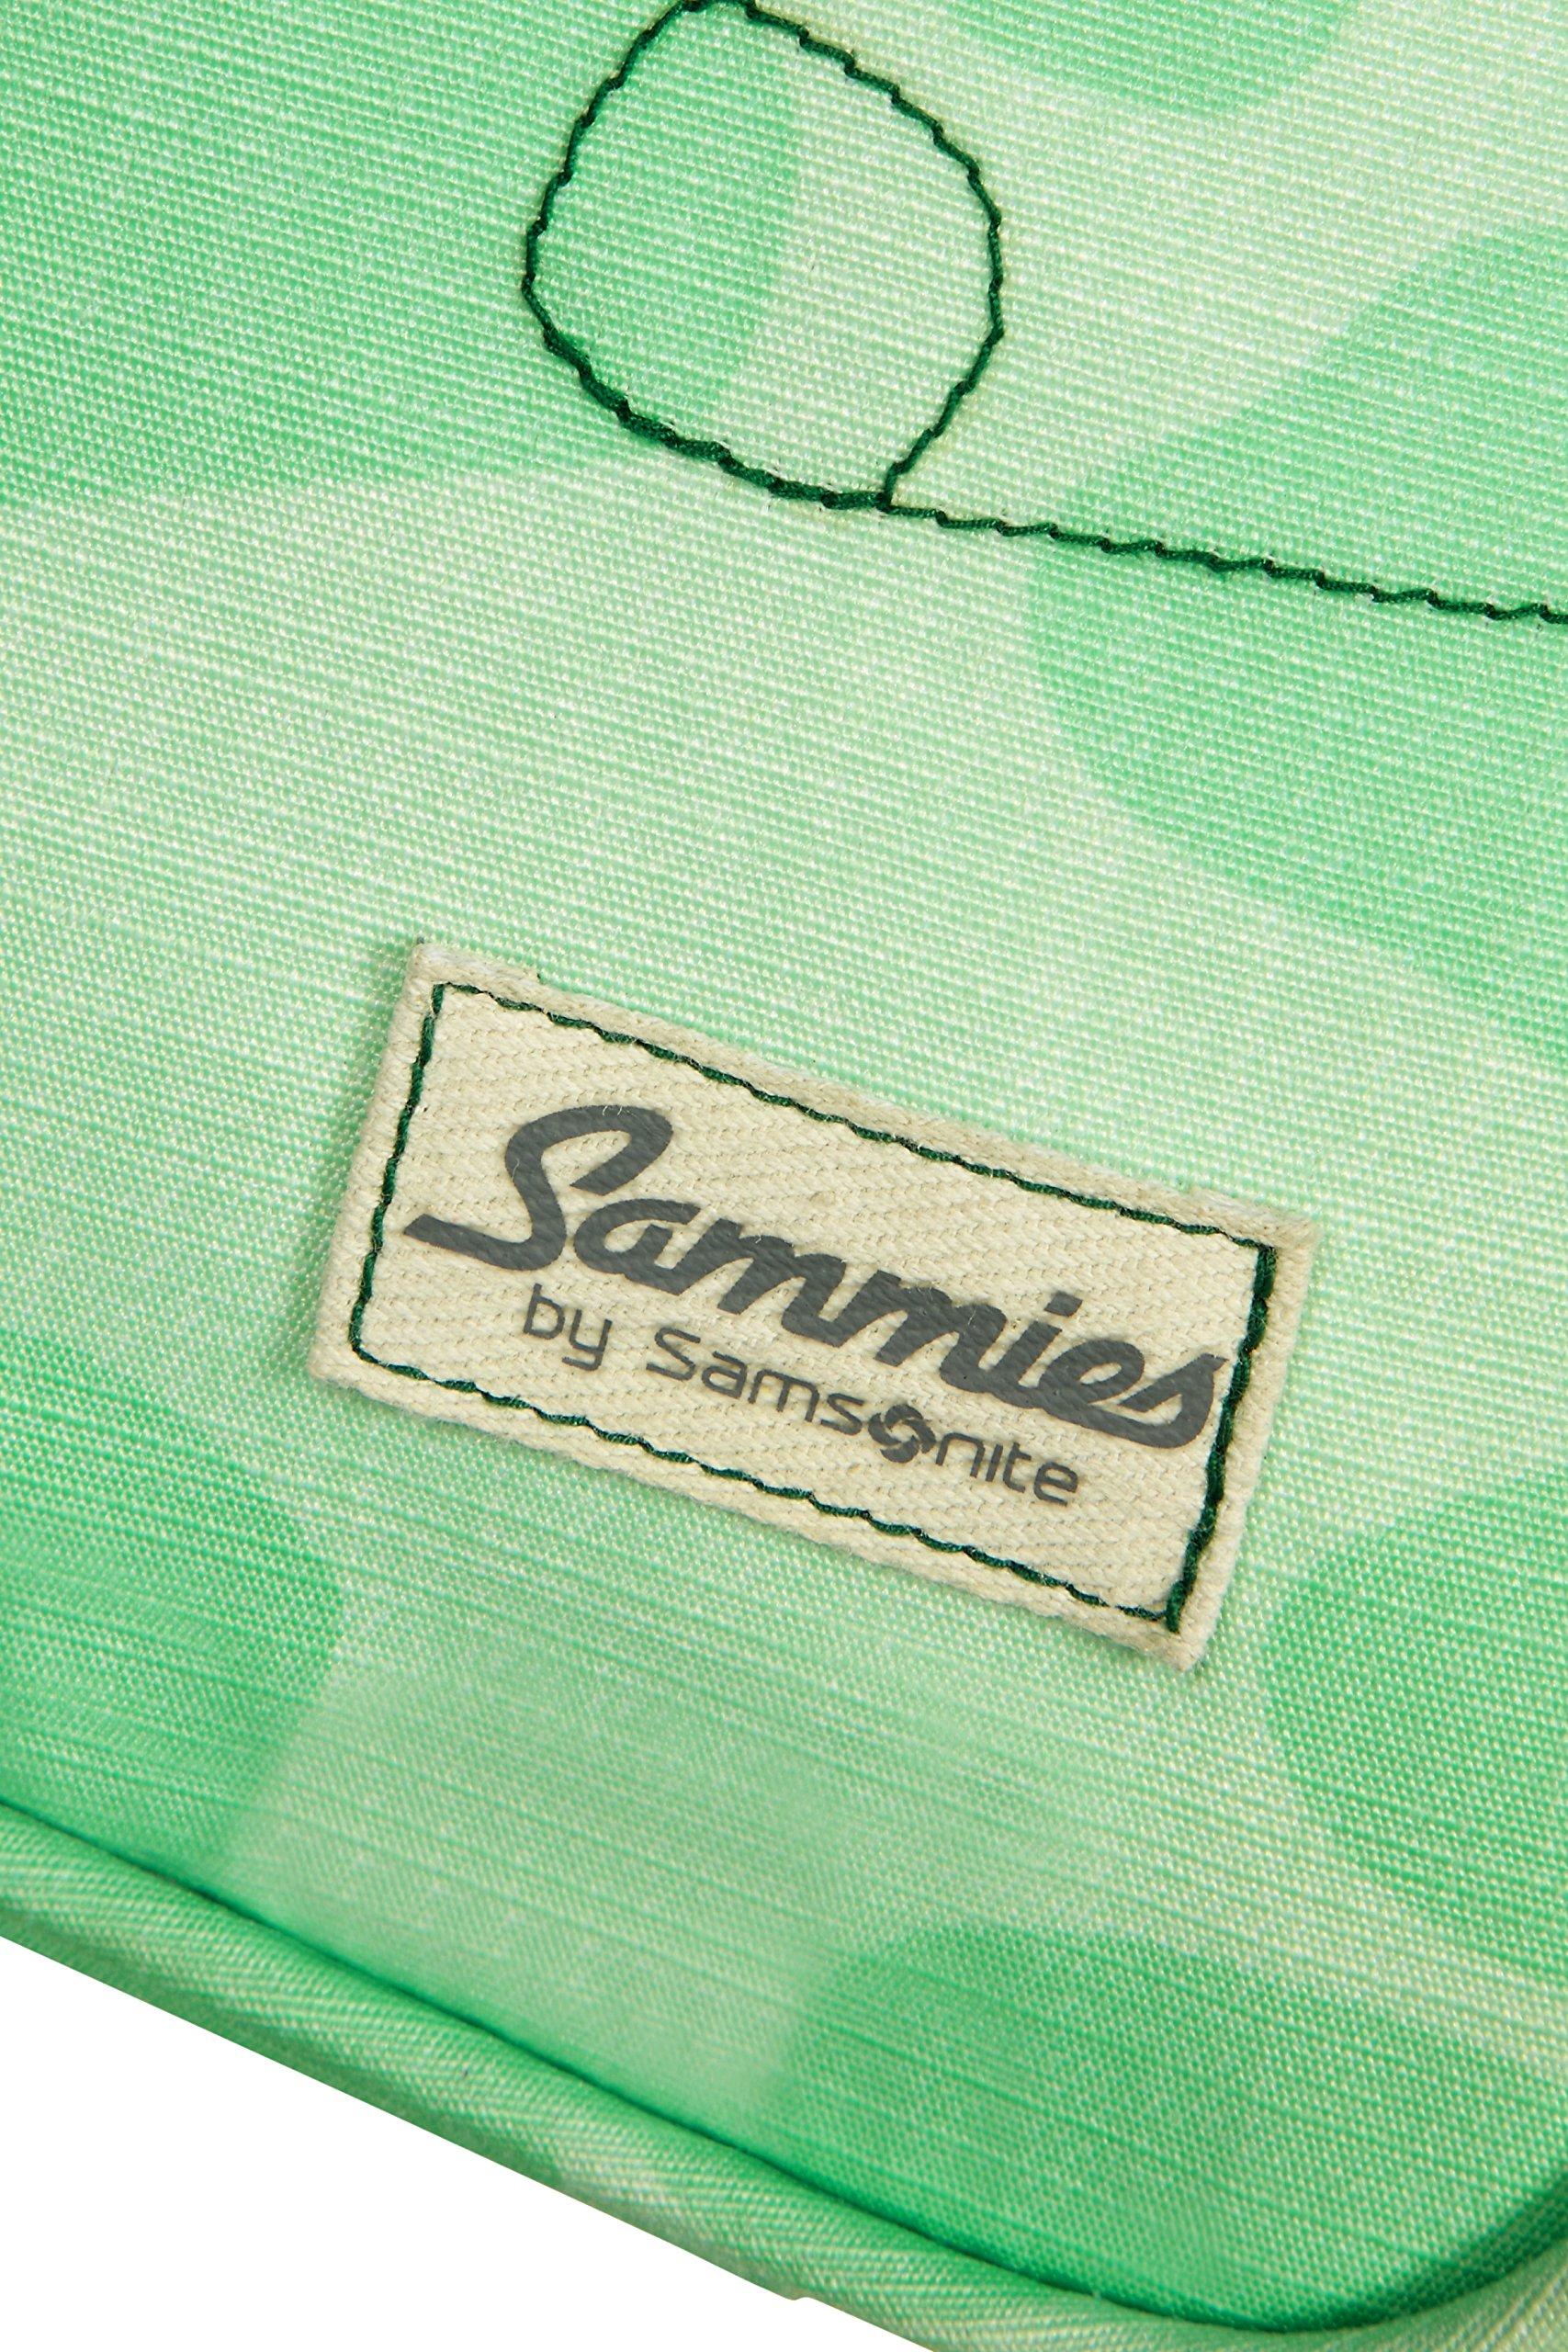 Happy-Sammies-Upright-4516